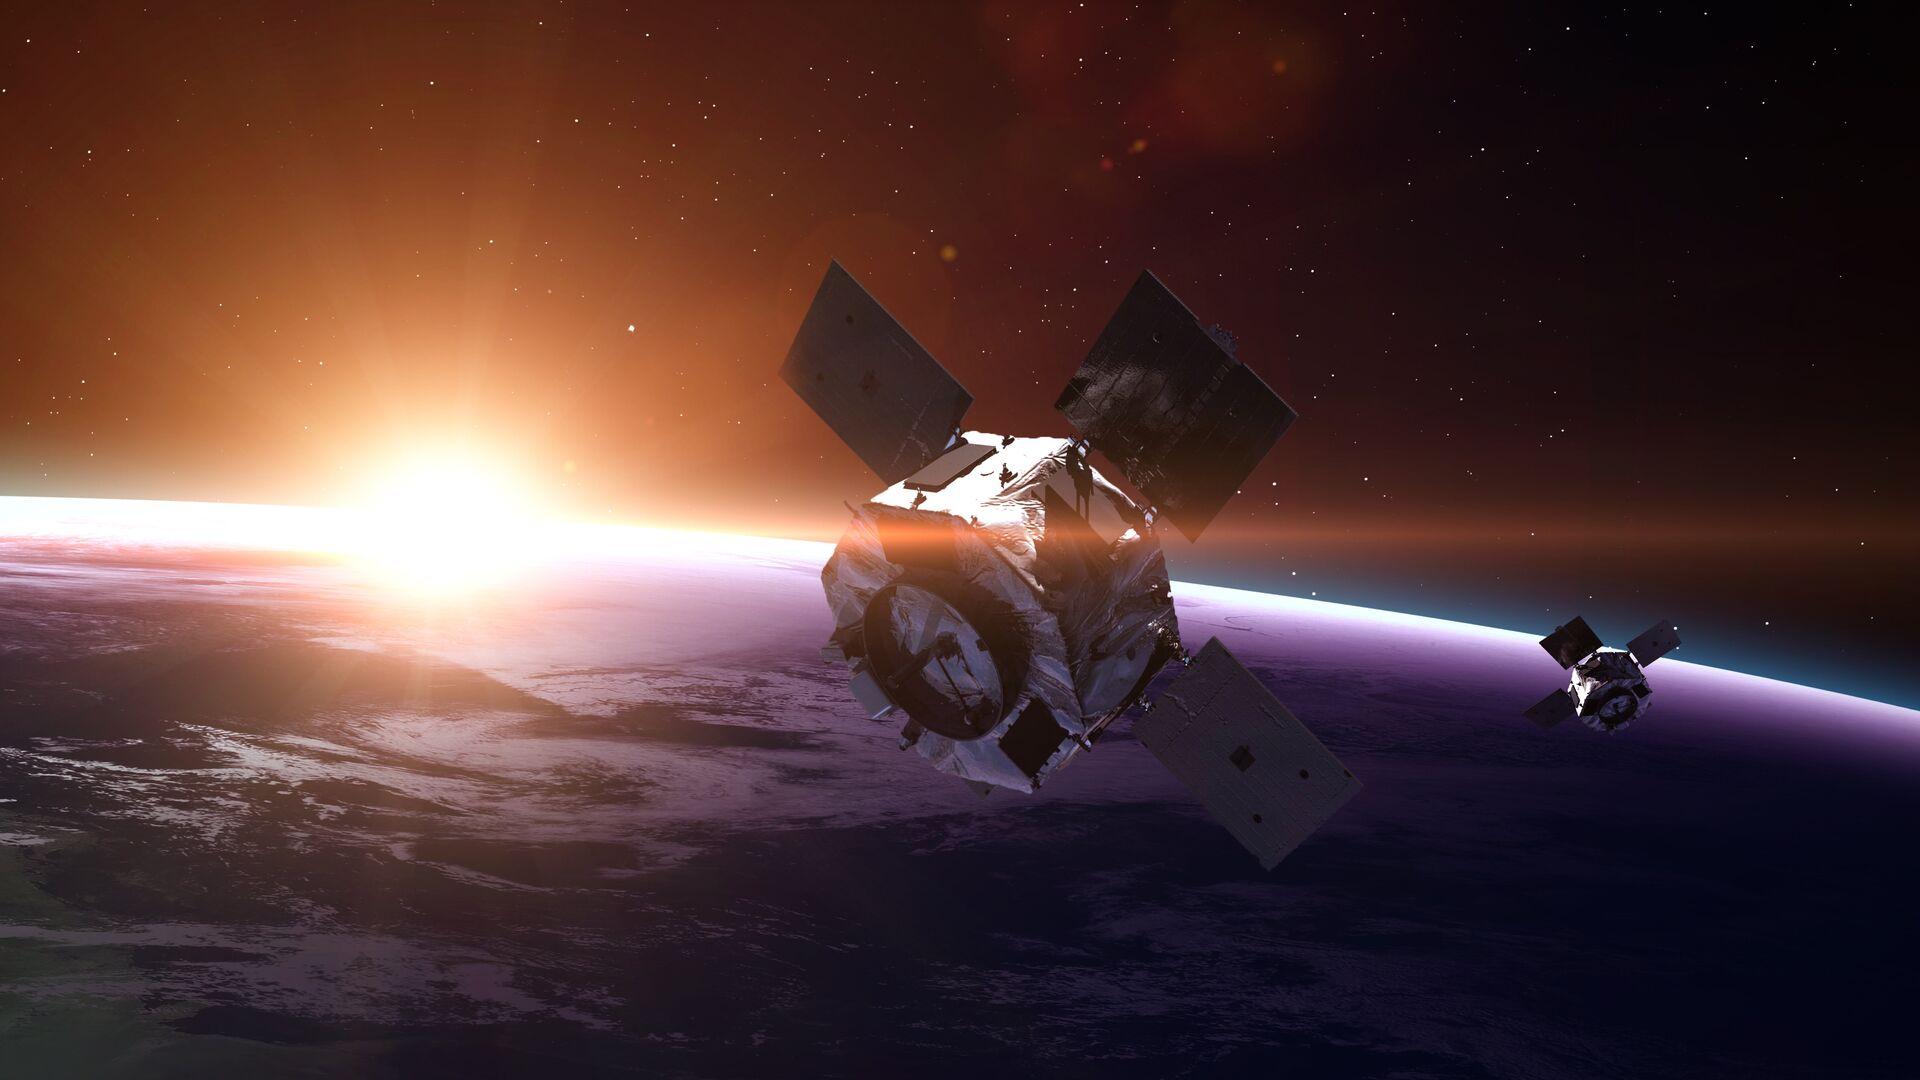 Спутники на Земной орбите - РИА Новости, 1920, 09.03.2021